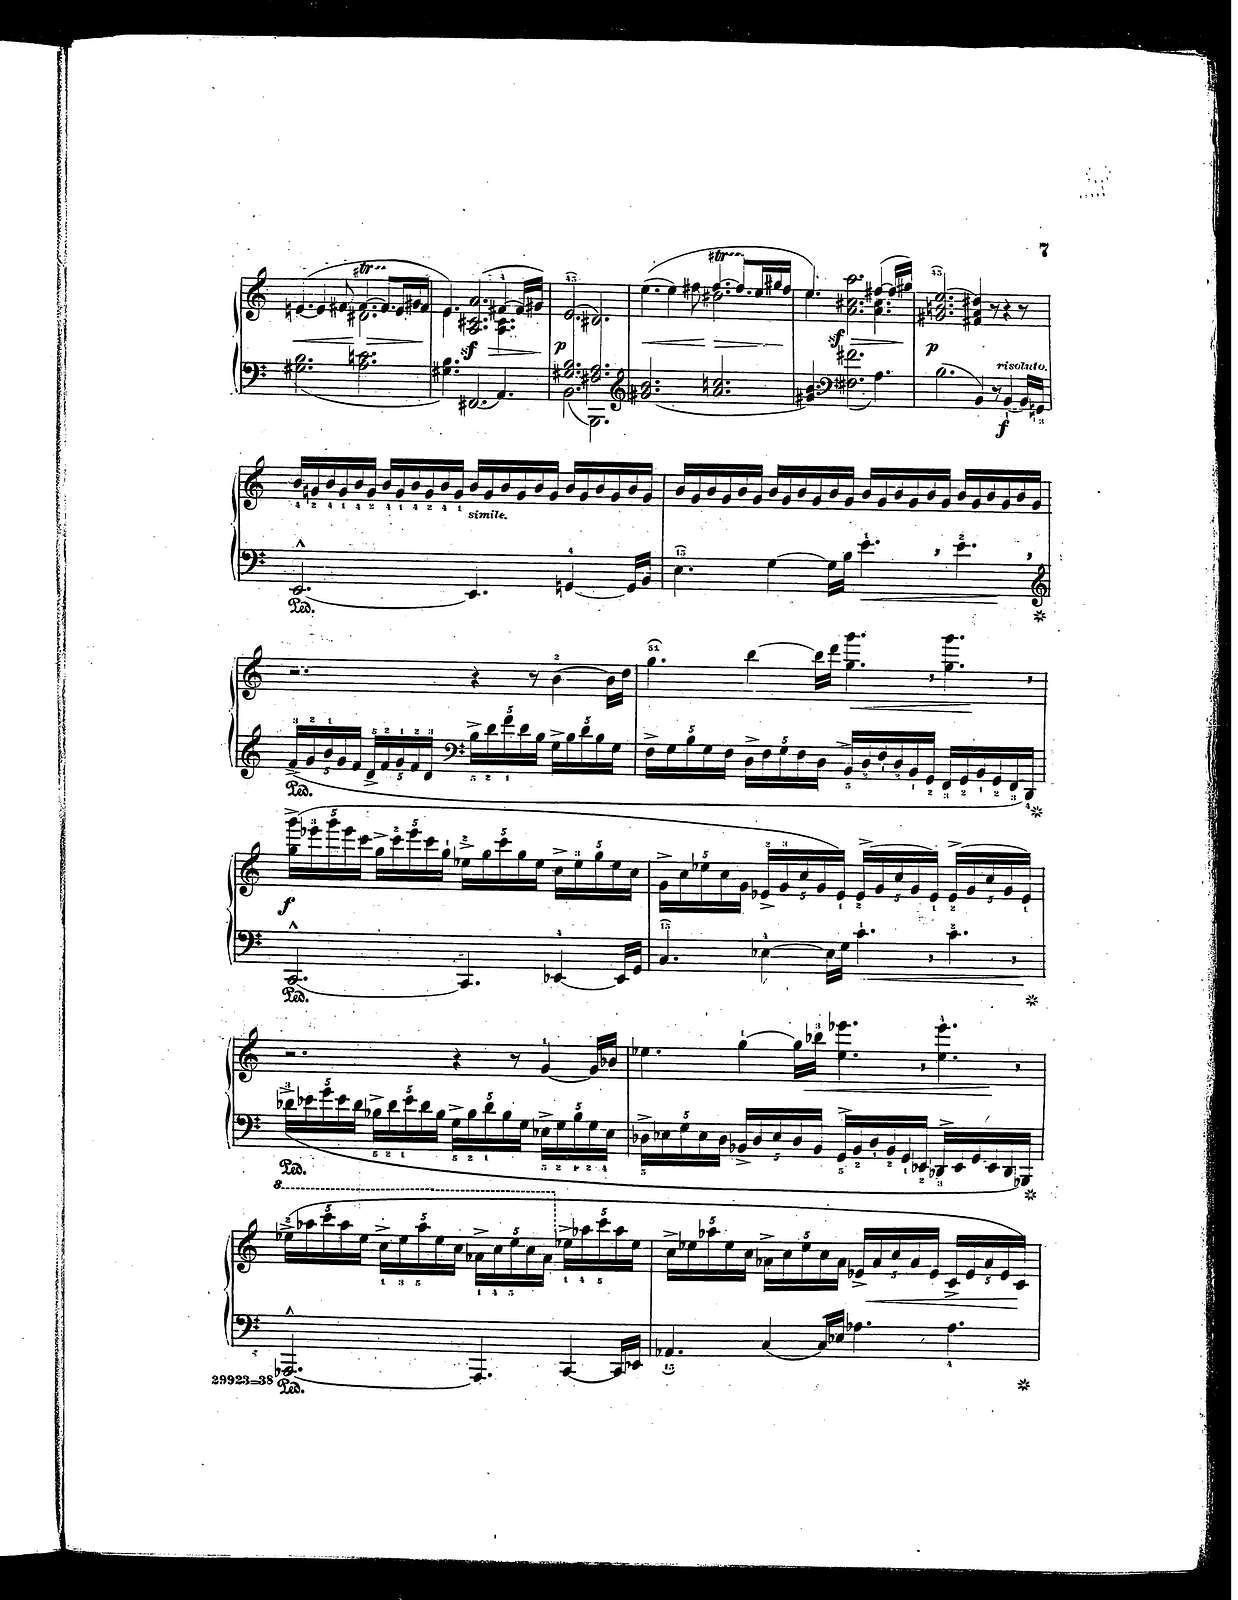 Beethoven's Sonatas, op. 57